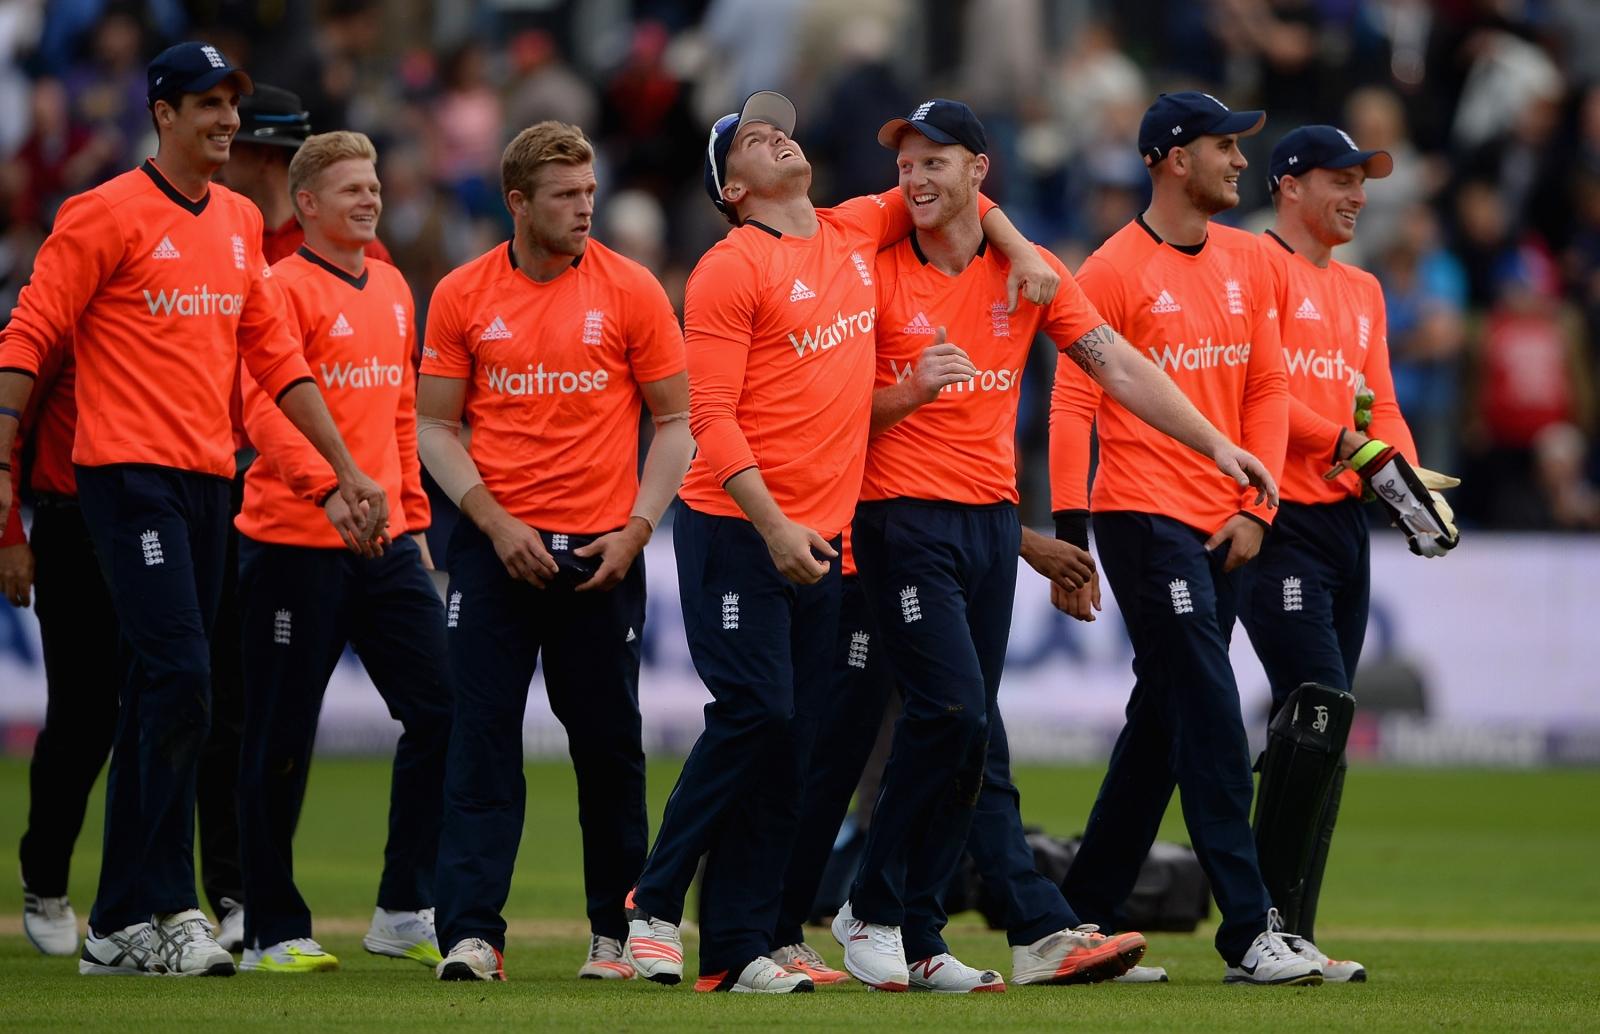 England T20